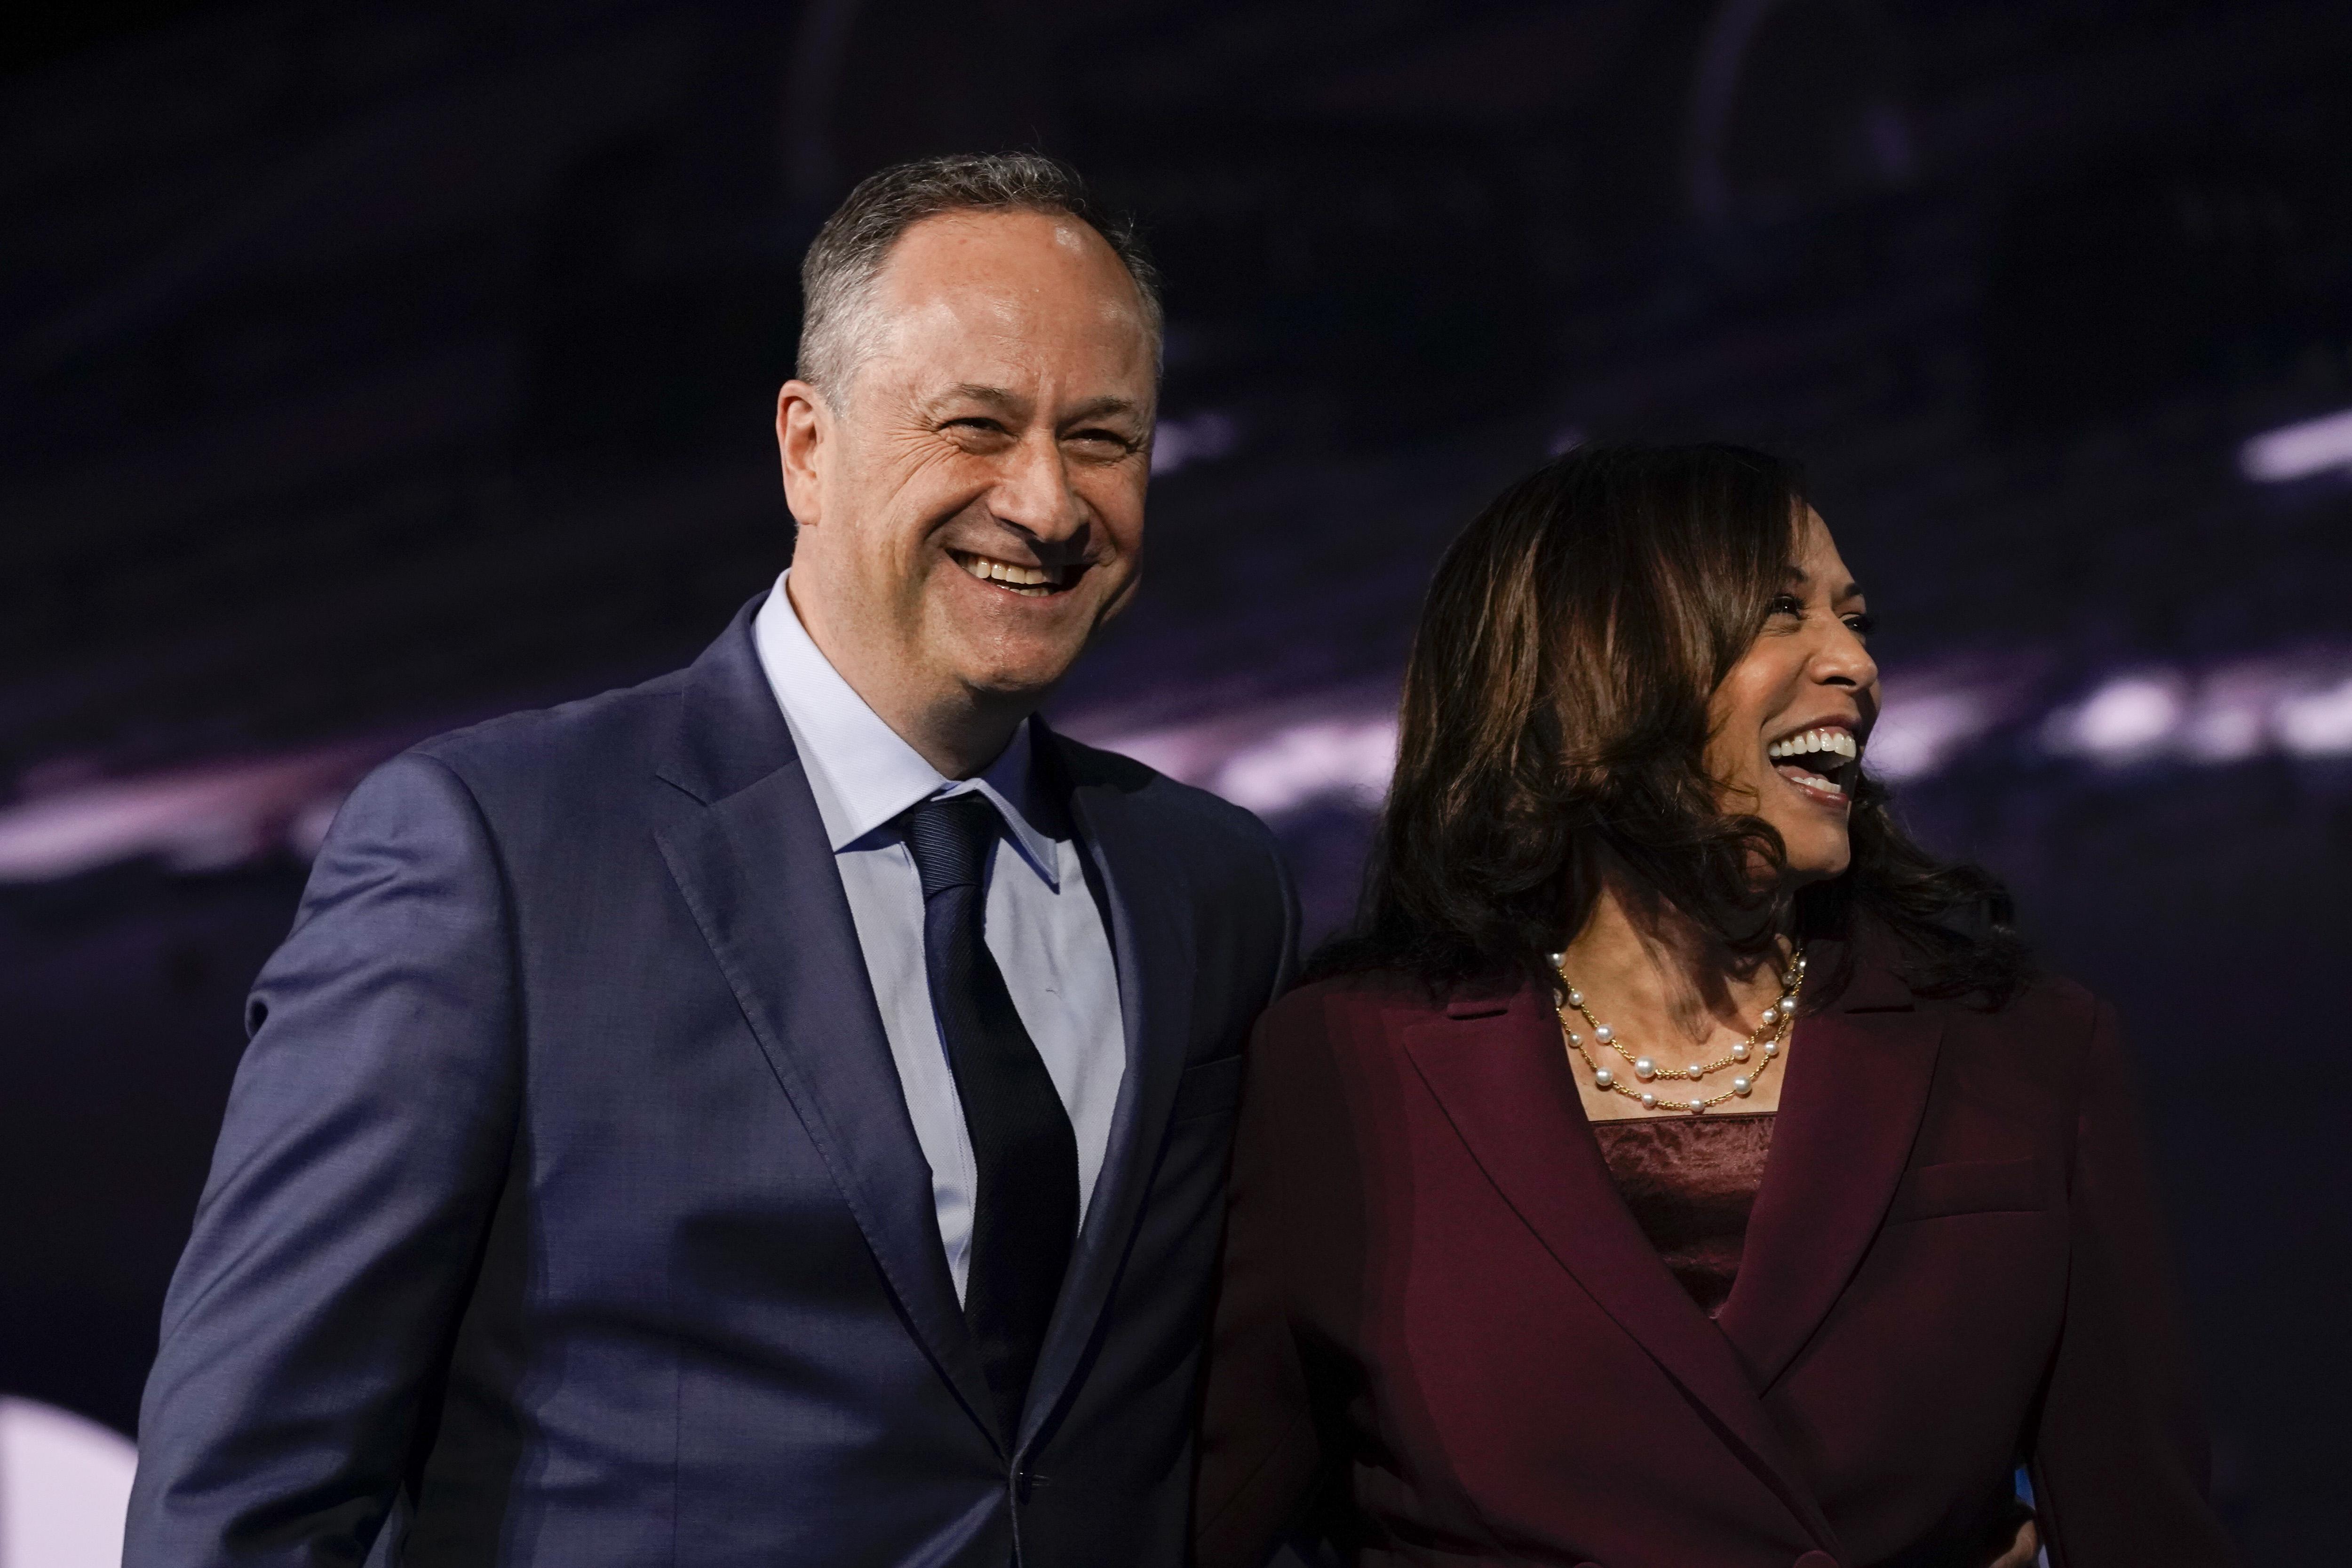 Kamala Harris Accepts Vice Presidential Nomination At Democratic National Convention